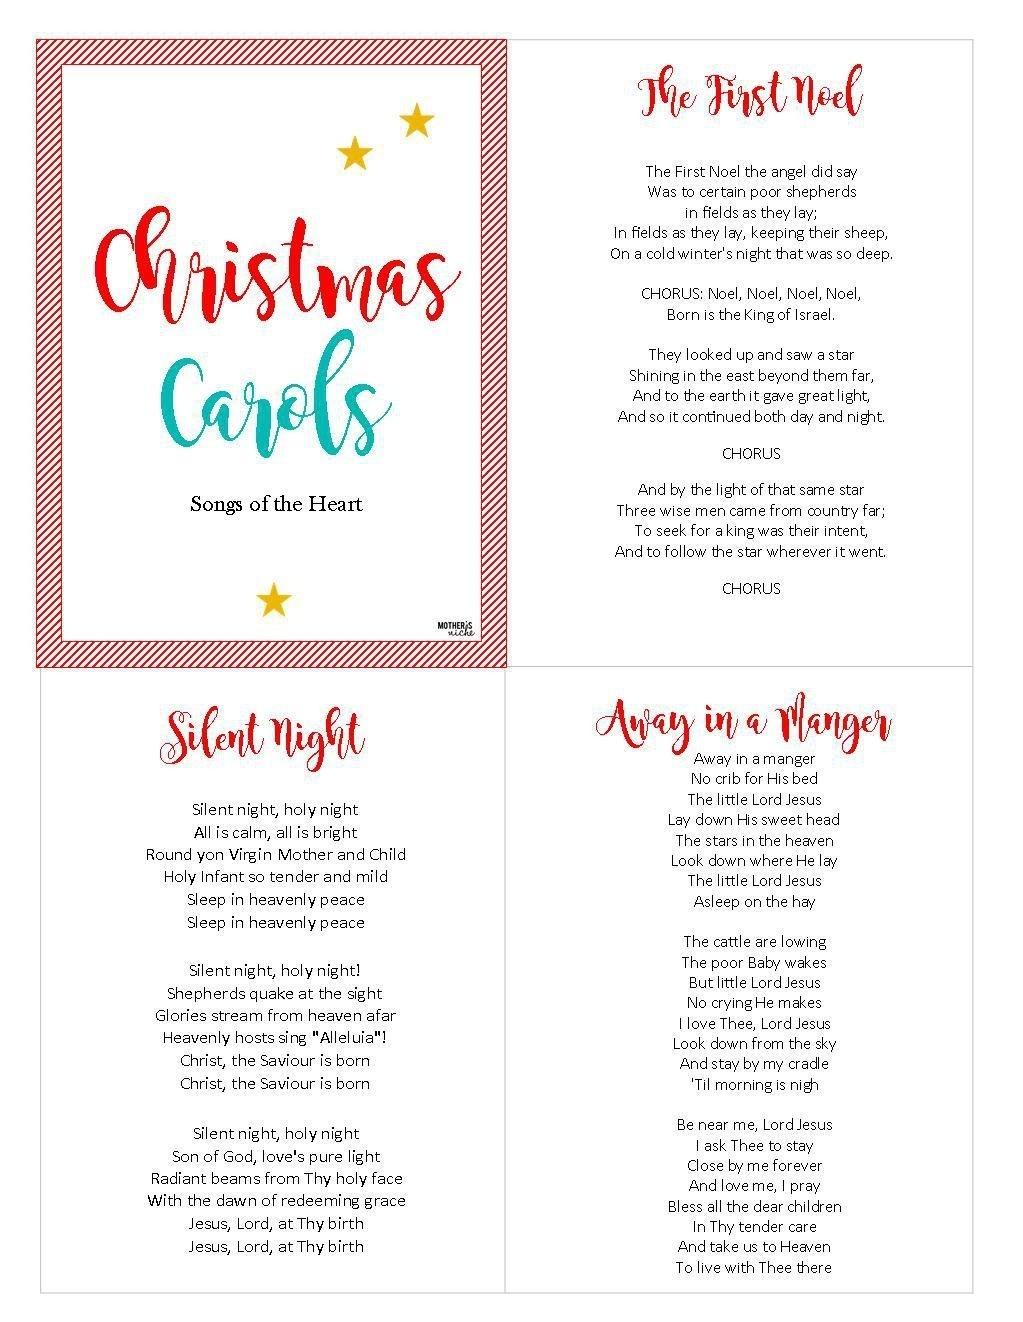 Christ-Centered Christmas Carols: Free Printable | Christmas 2018 - Free Printable Christmas Carols Booklet